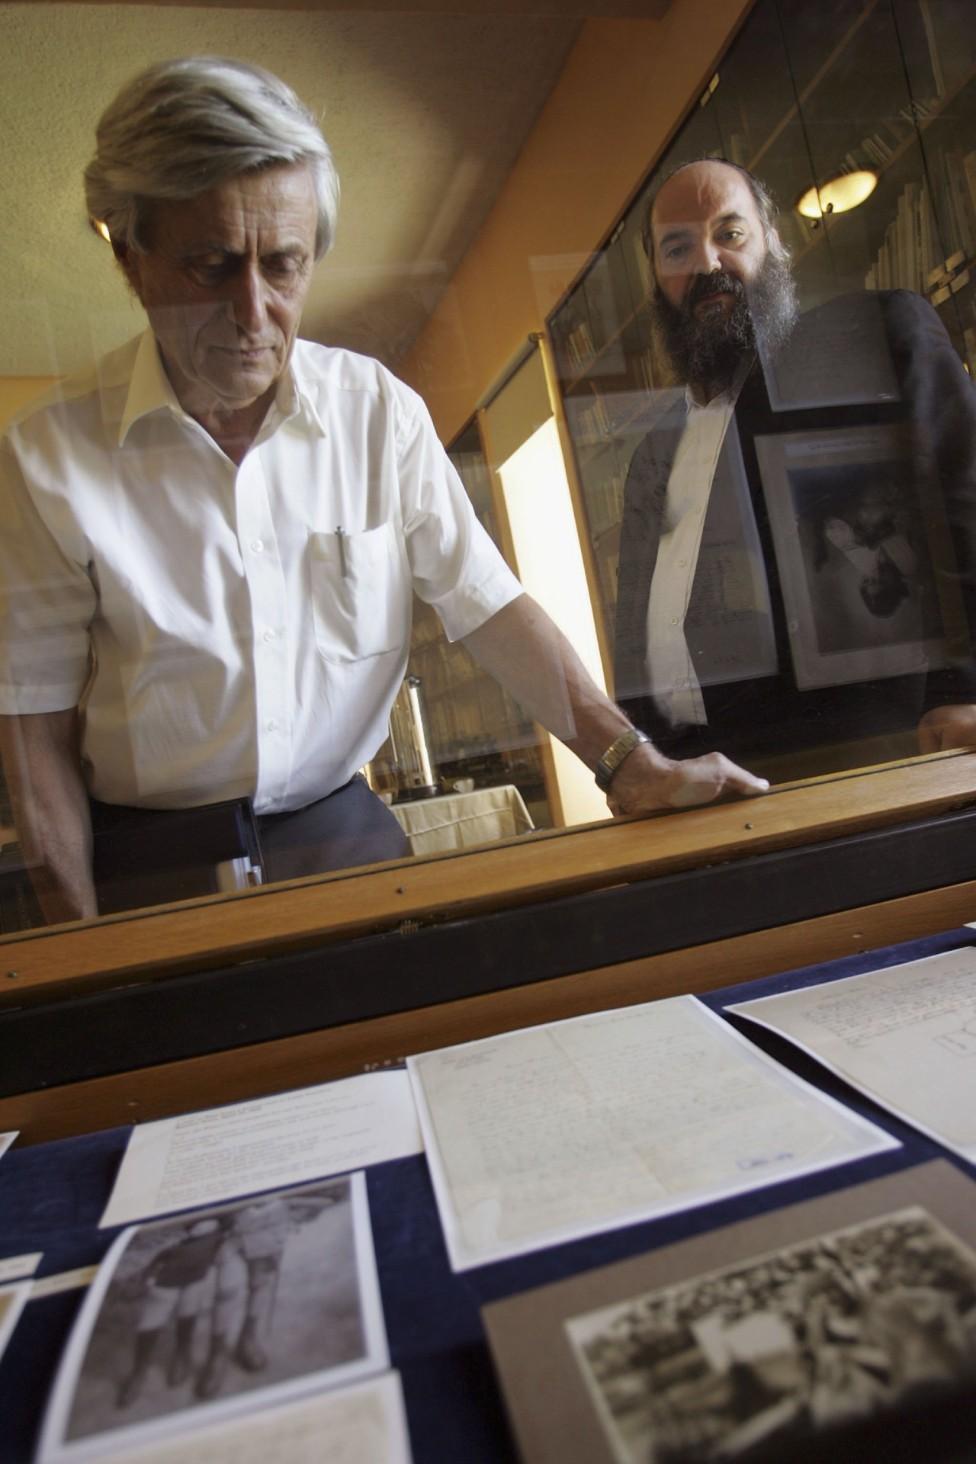 Professor Gutfreund (left) with Albert Einstein's papers held at the Hebrew University in Jerusalem, Israel